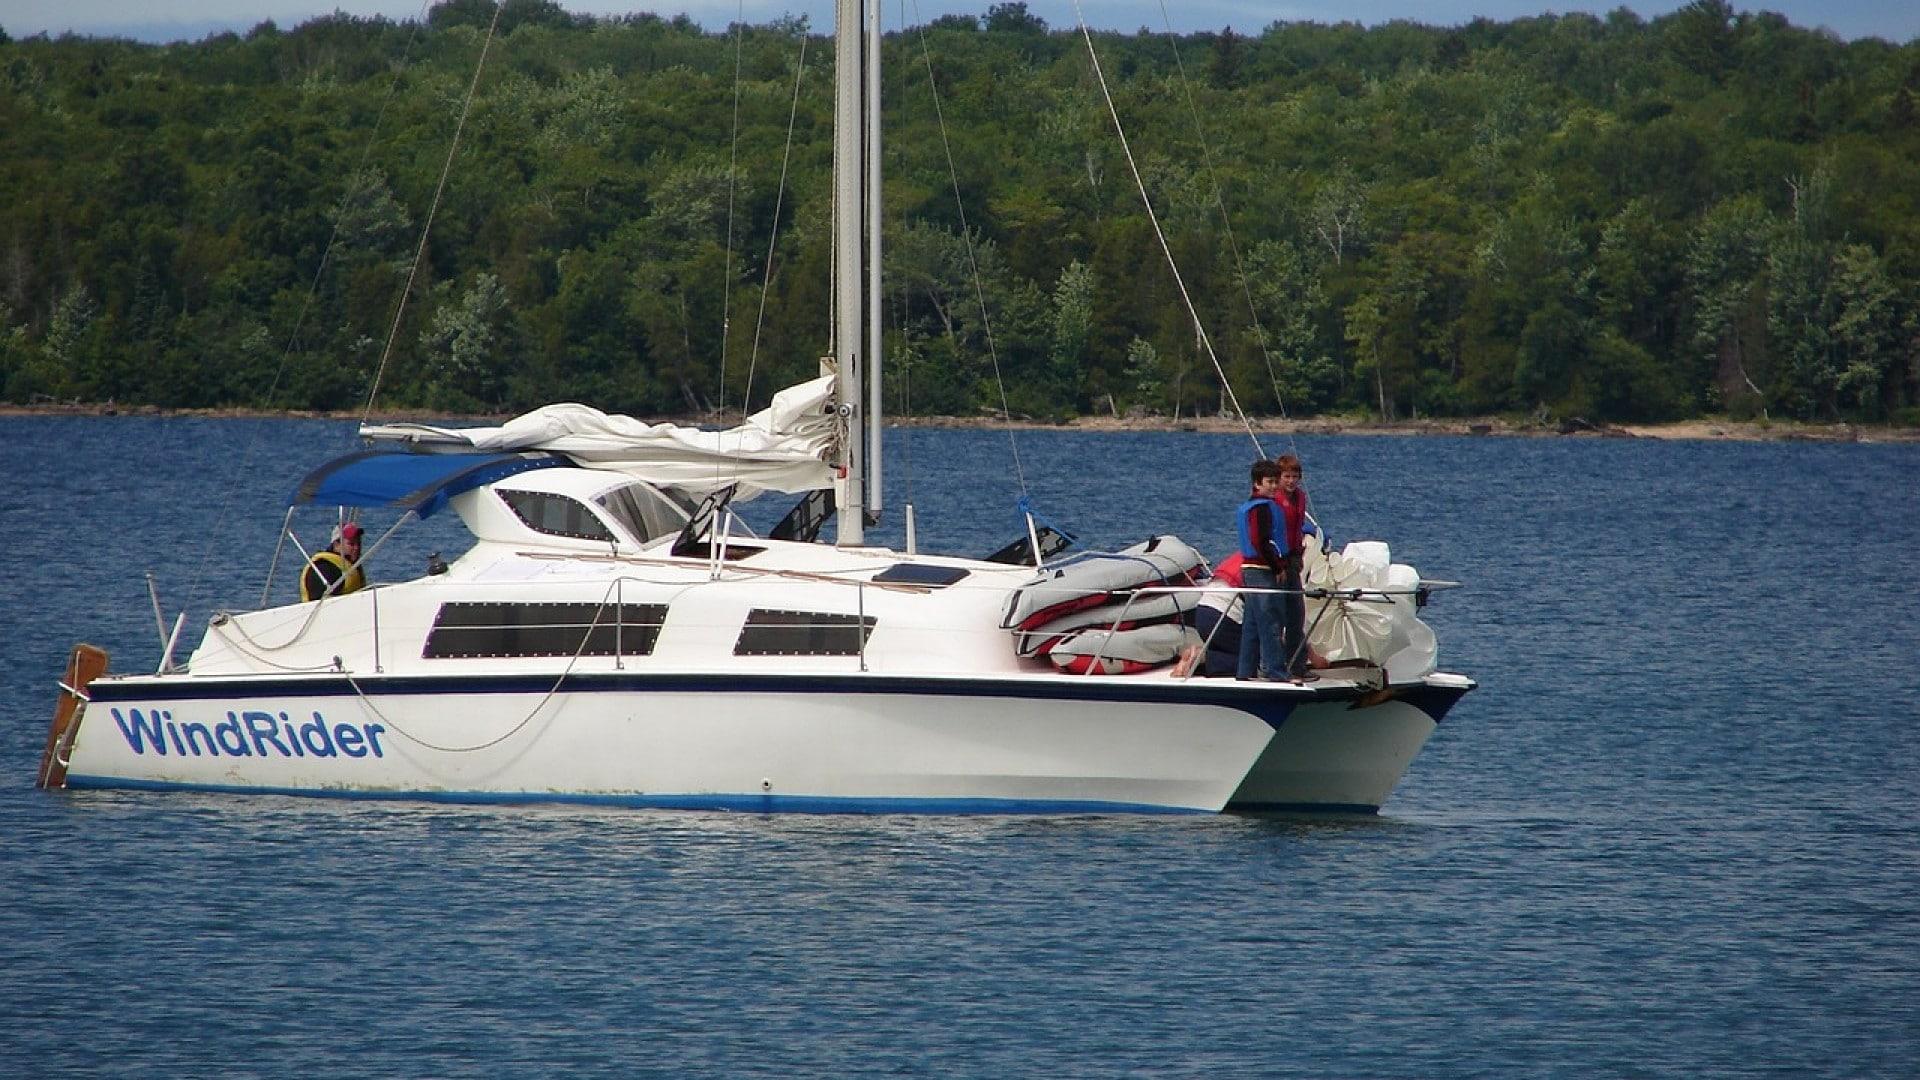 Pourquoi voyager en catamaran